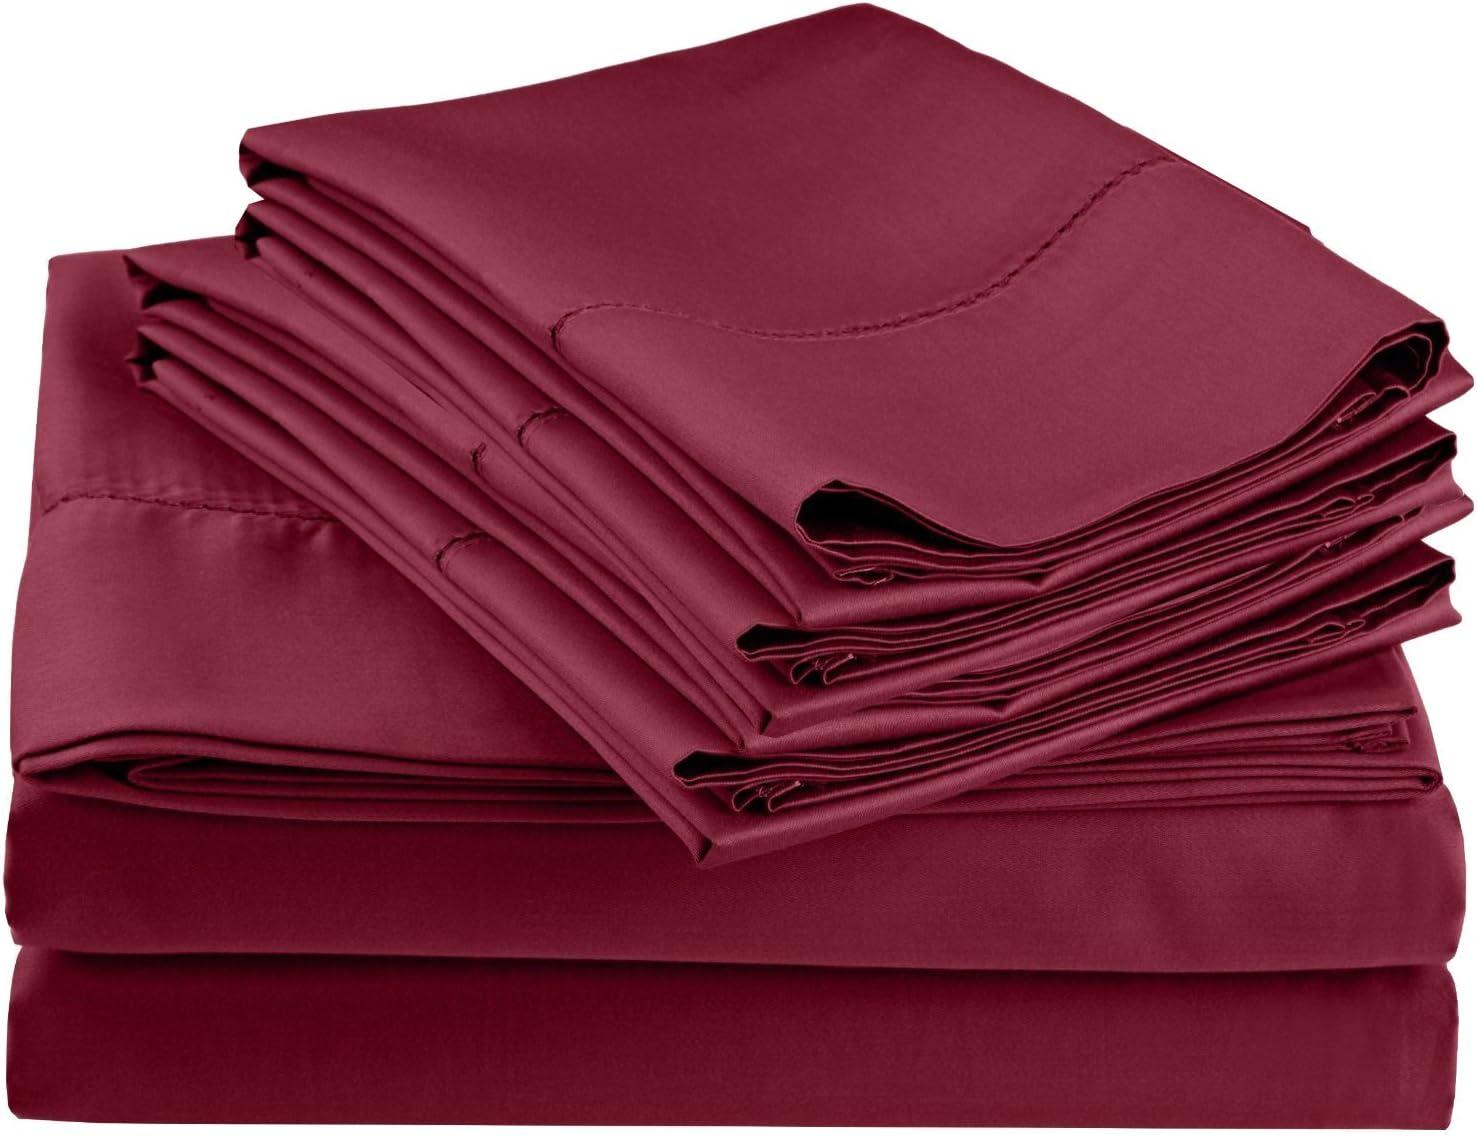 600 Thread Count Rich Hem Limited price sale Stitch Pillowcase Bonus Long-awaited Sheet with Set